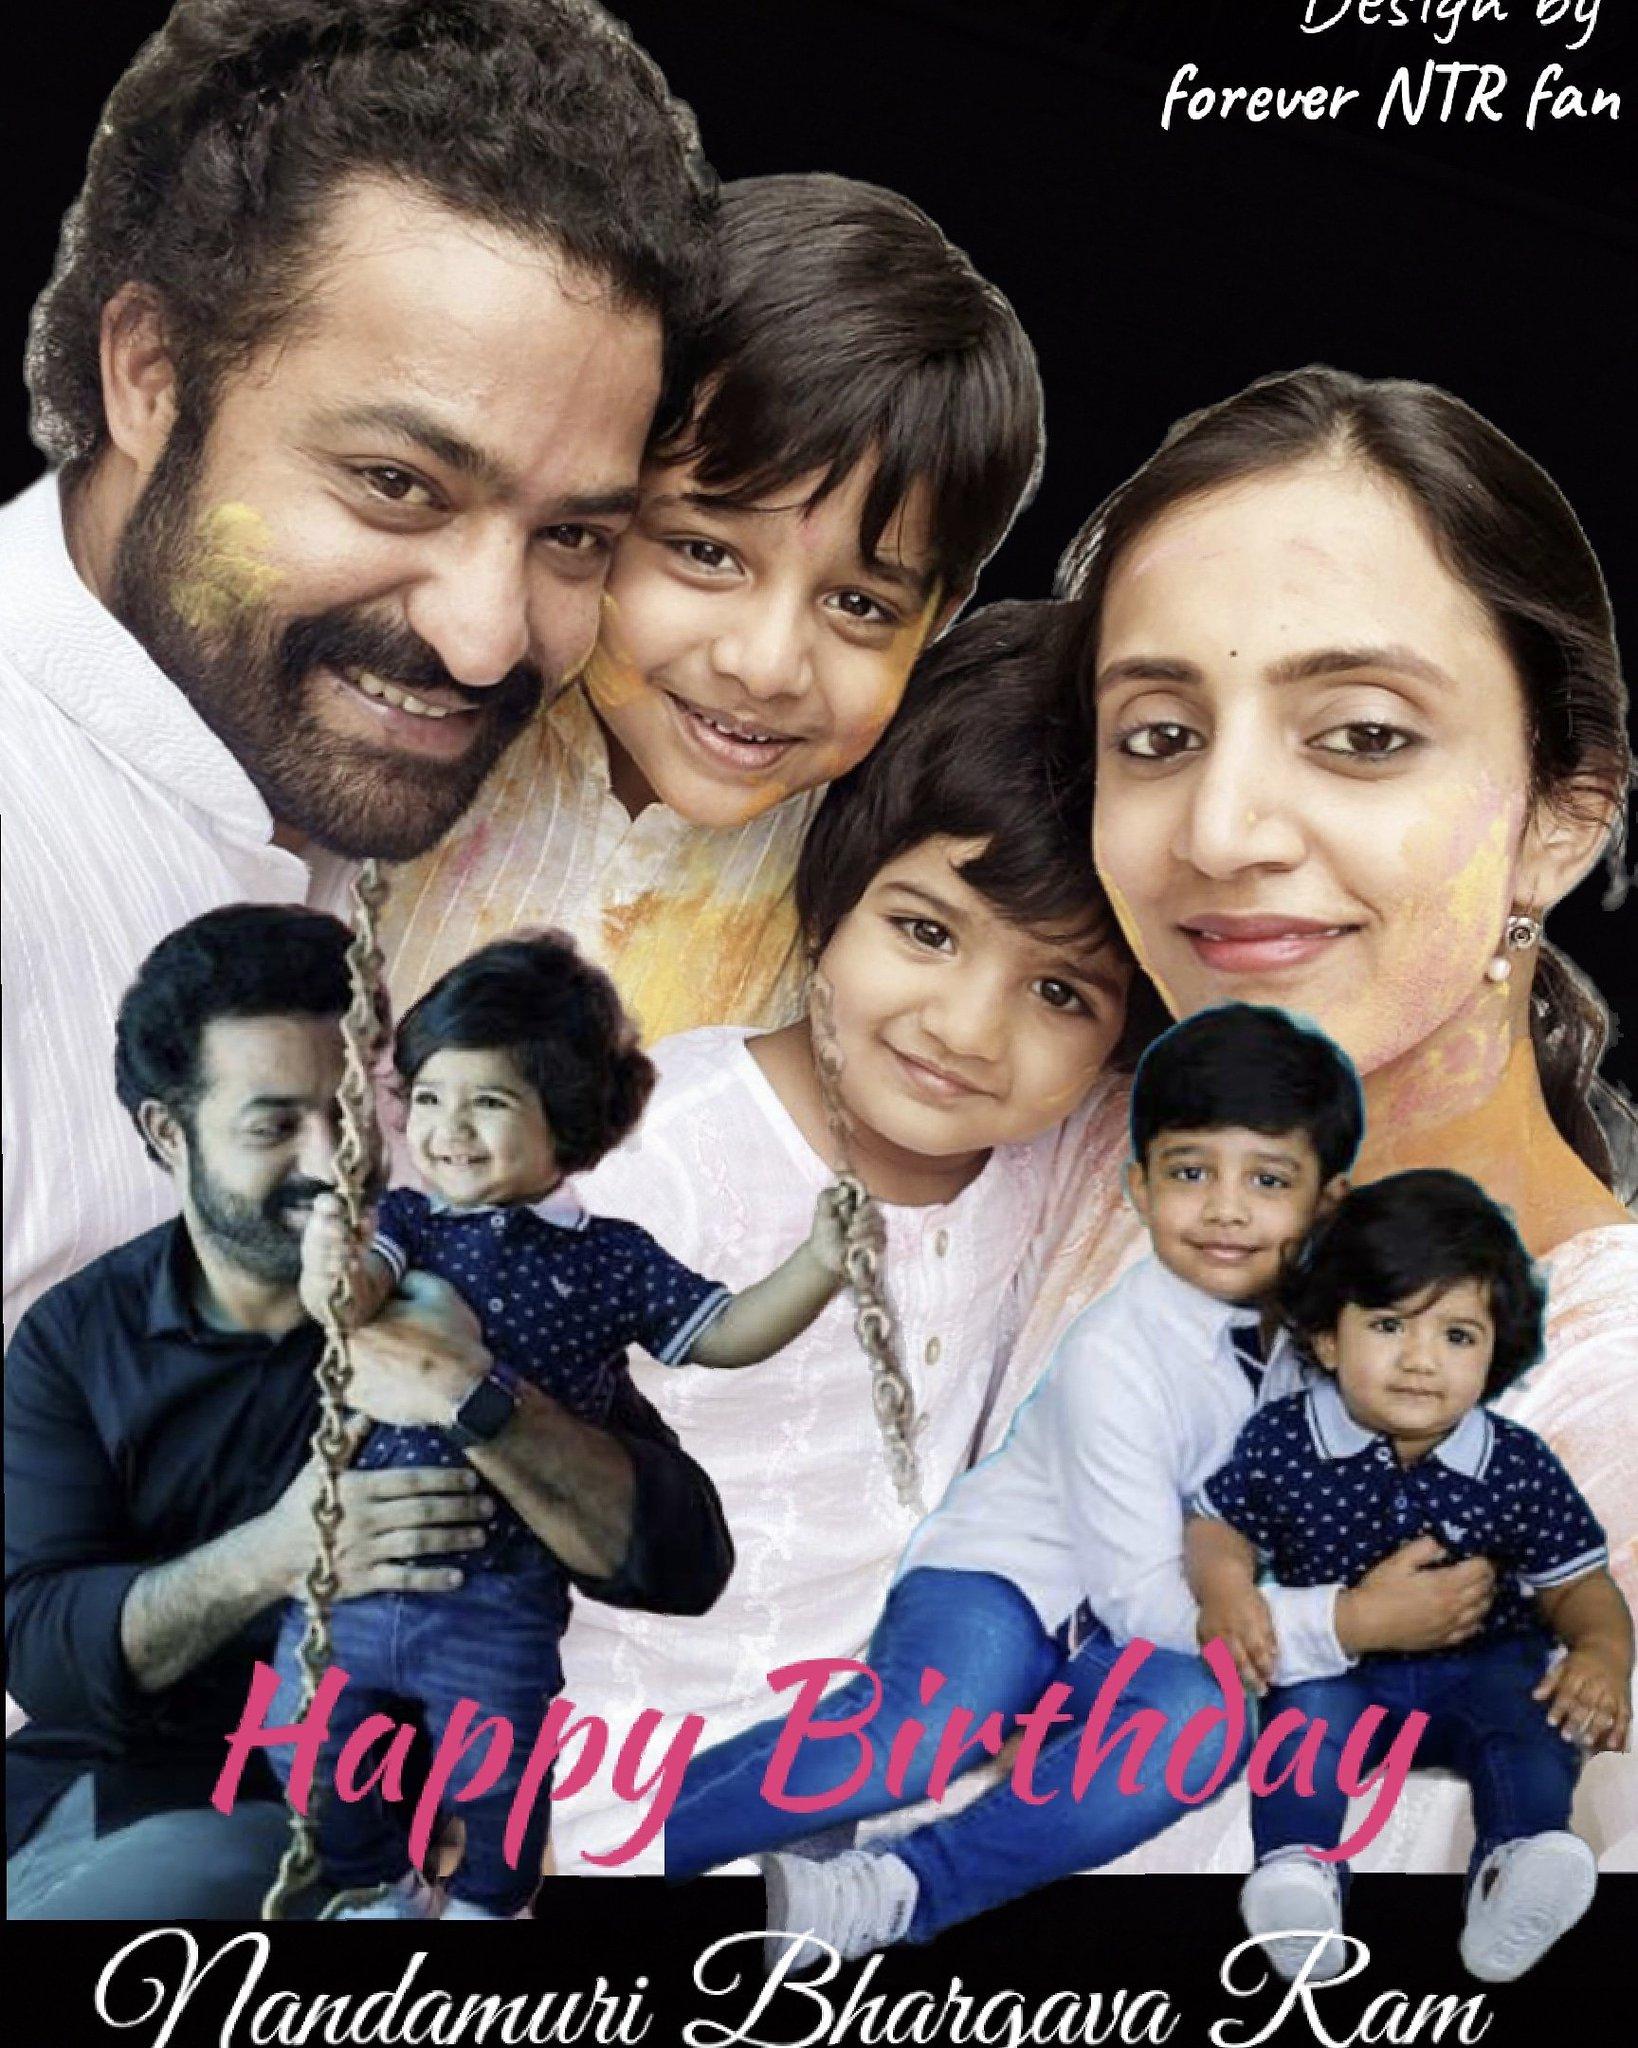 Wishing a  Happy Birthday to our little Prince  Nandamuri Bhargava Ram